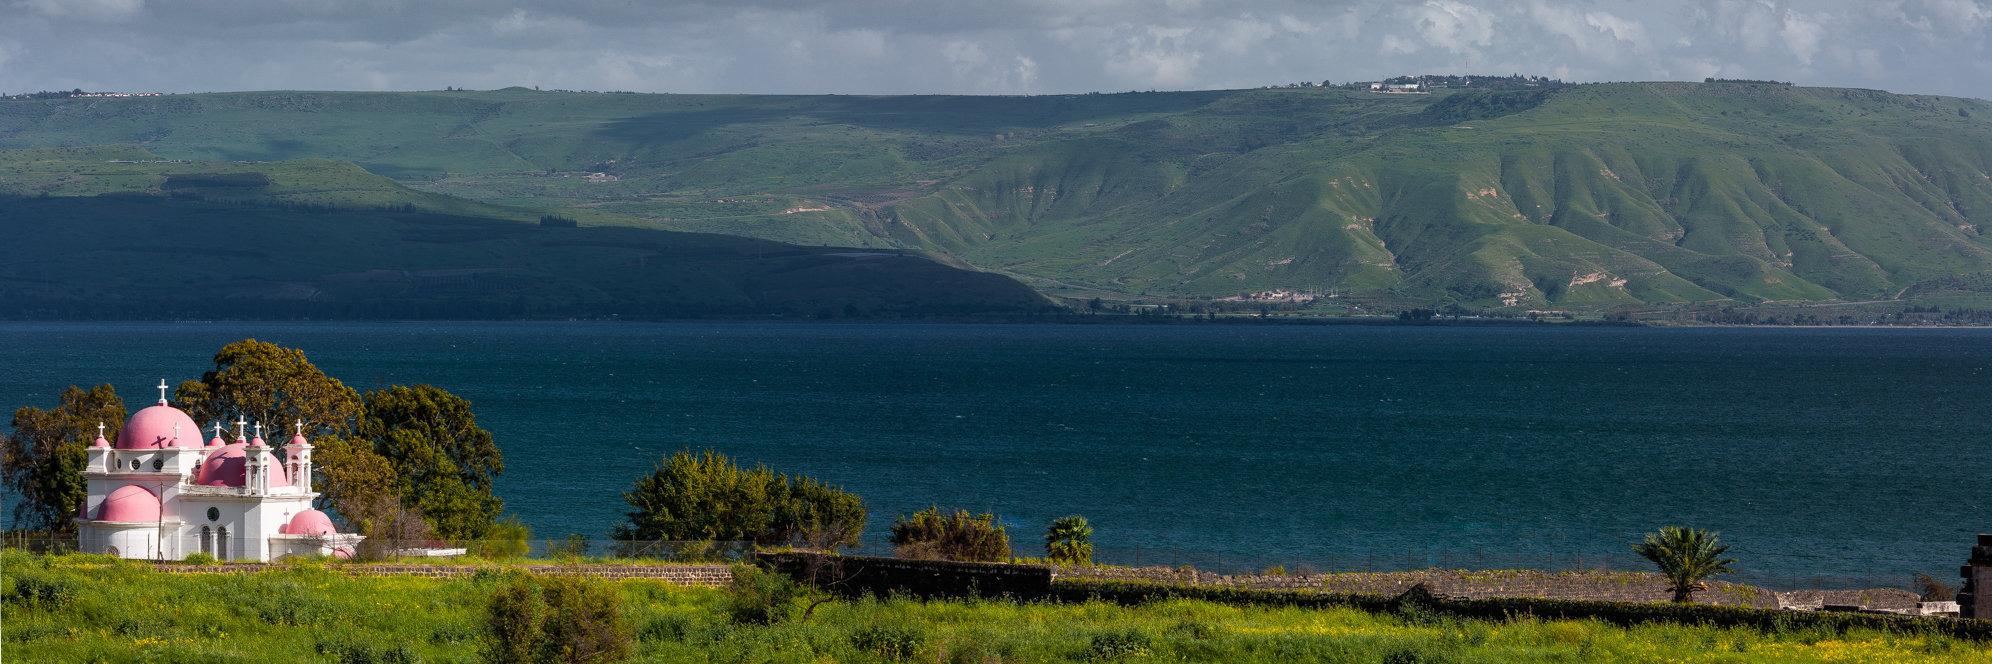 Israël, Galilée, Capharnaüm, Lac de Tibériade